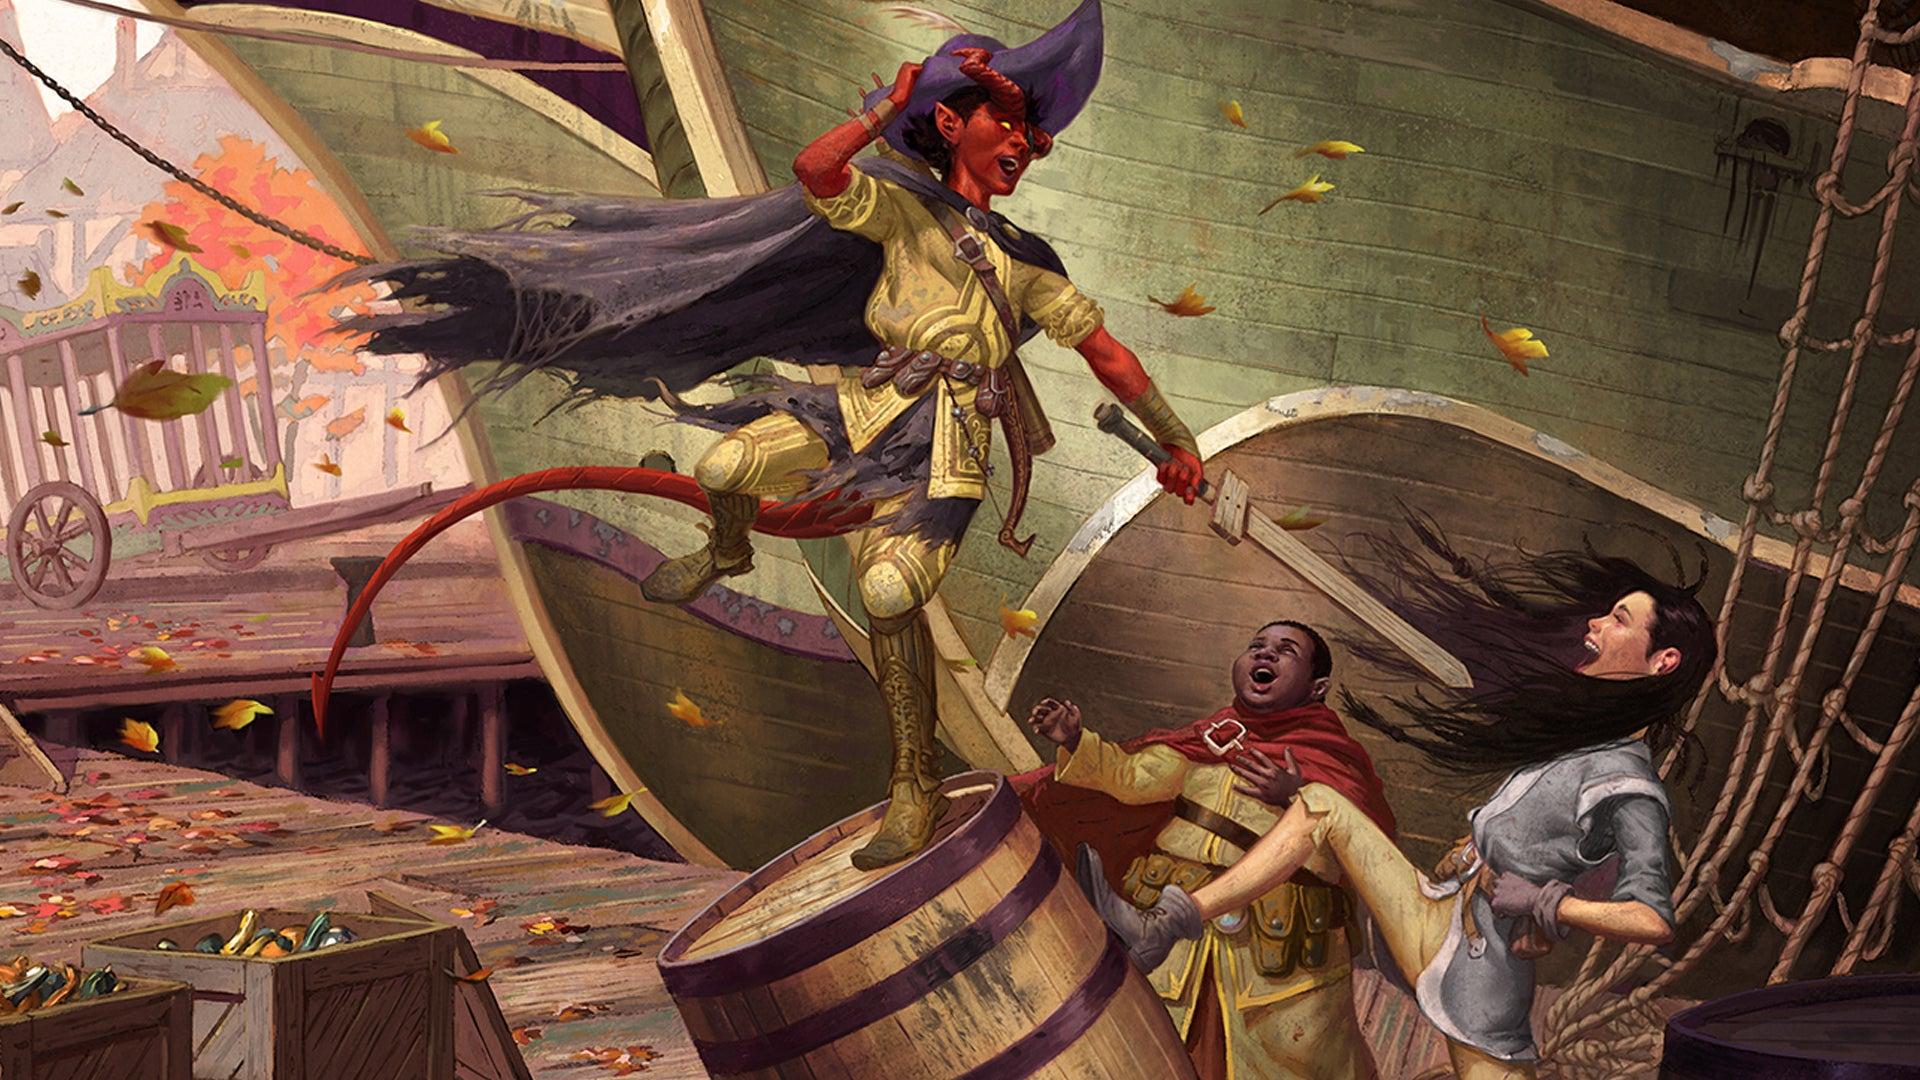 Dungeons & Dragons roleplaying game artwork 16